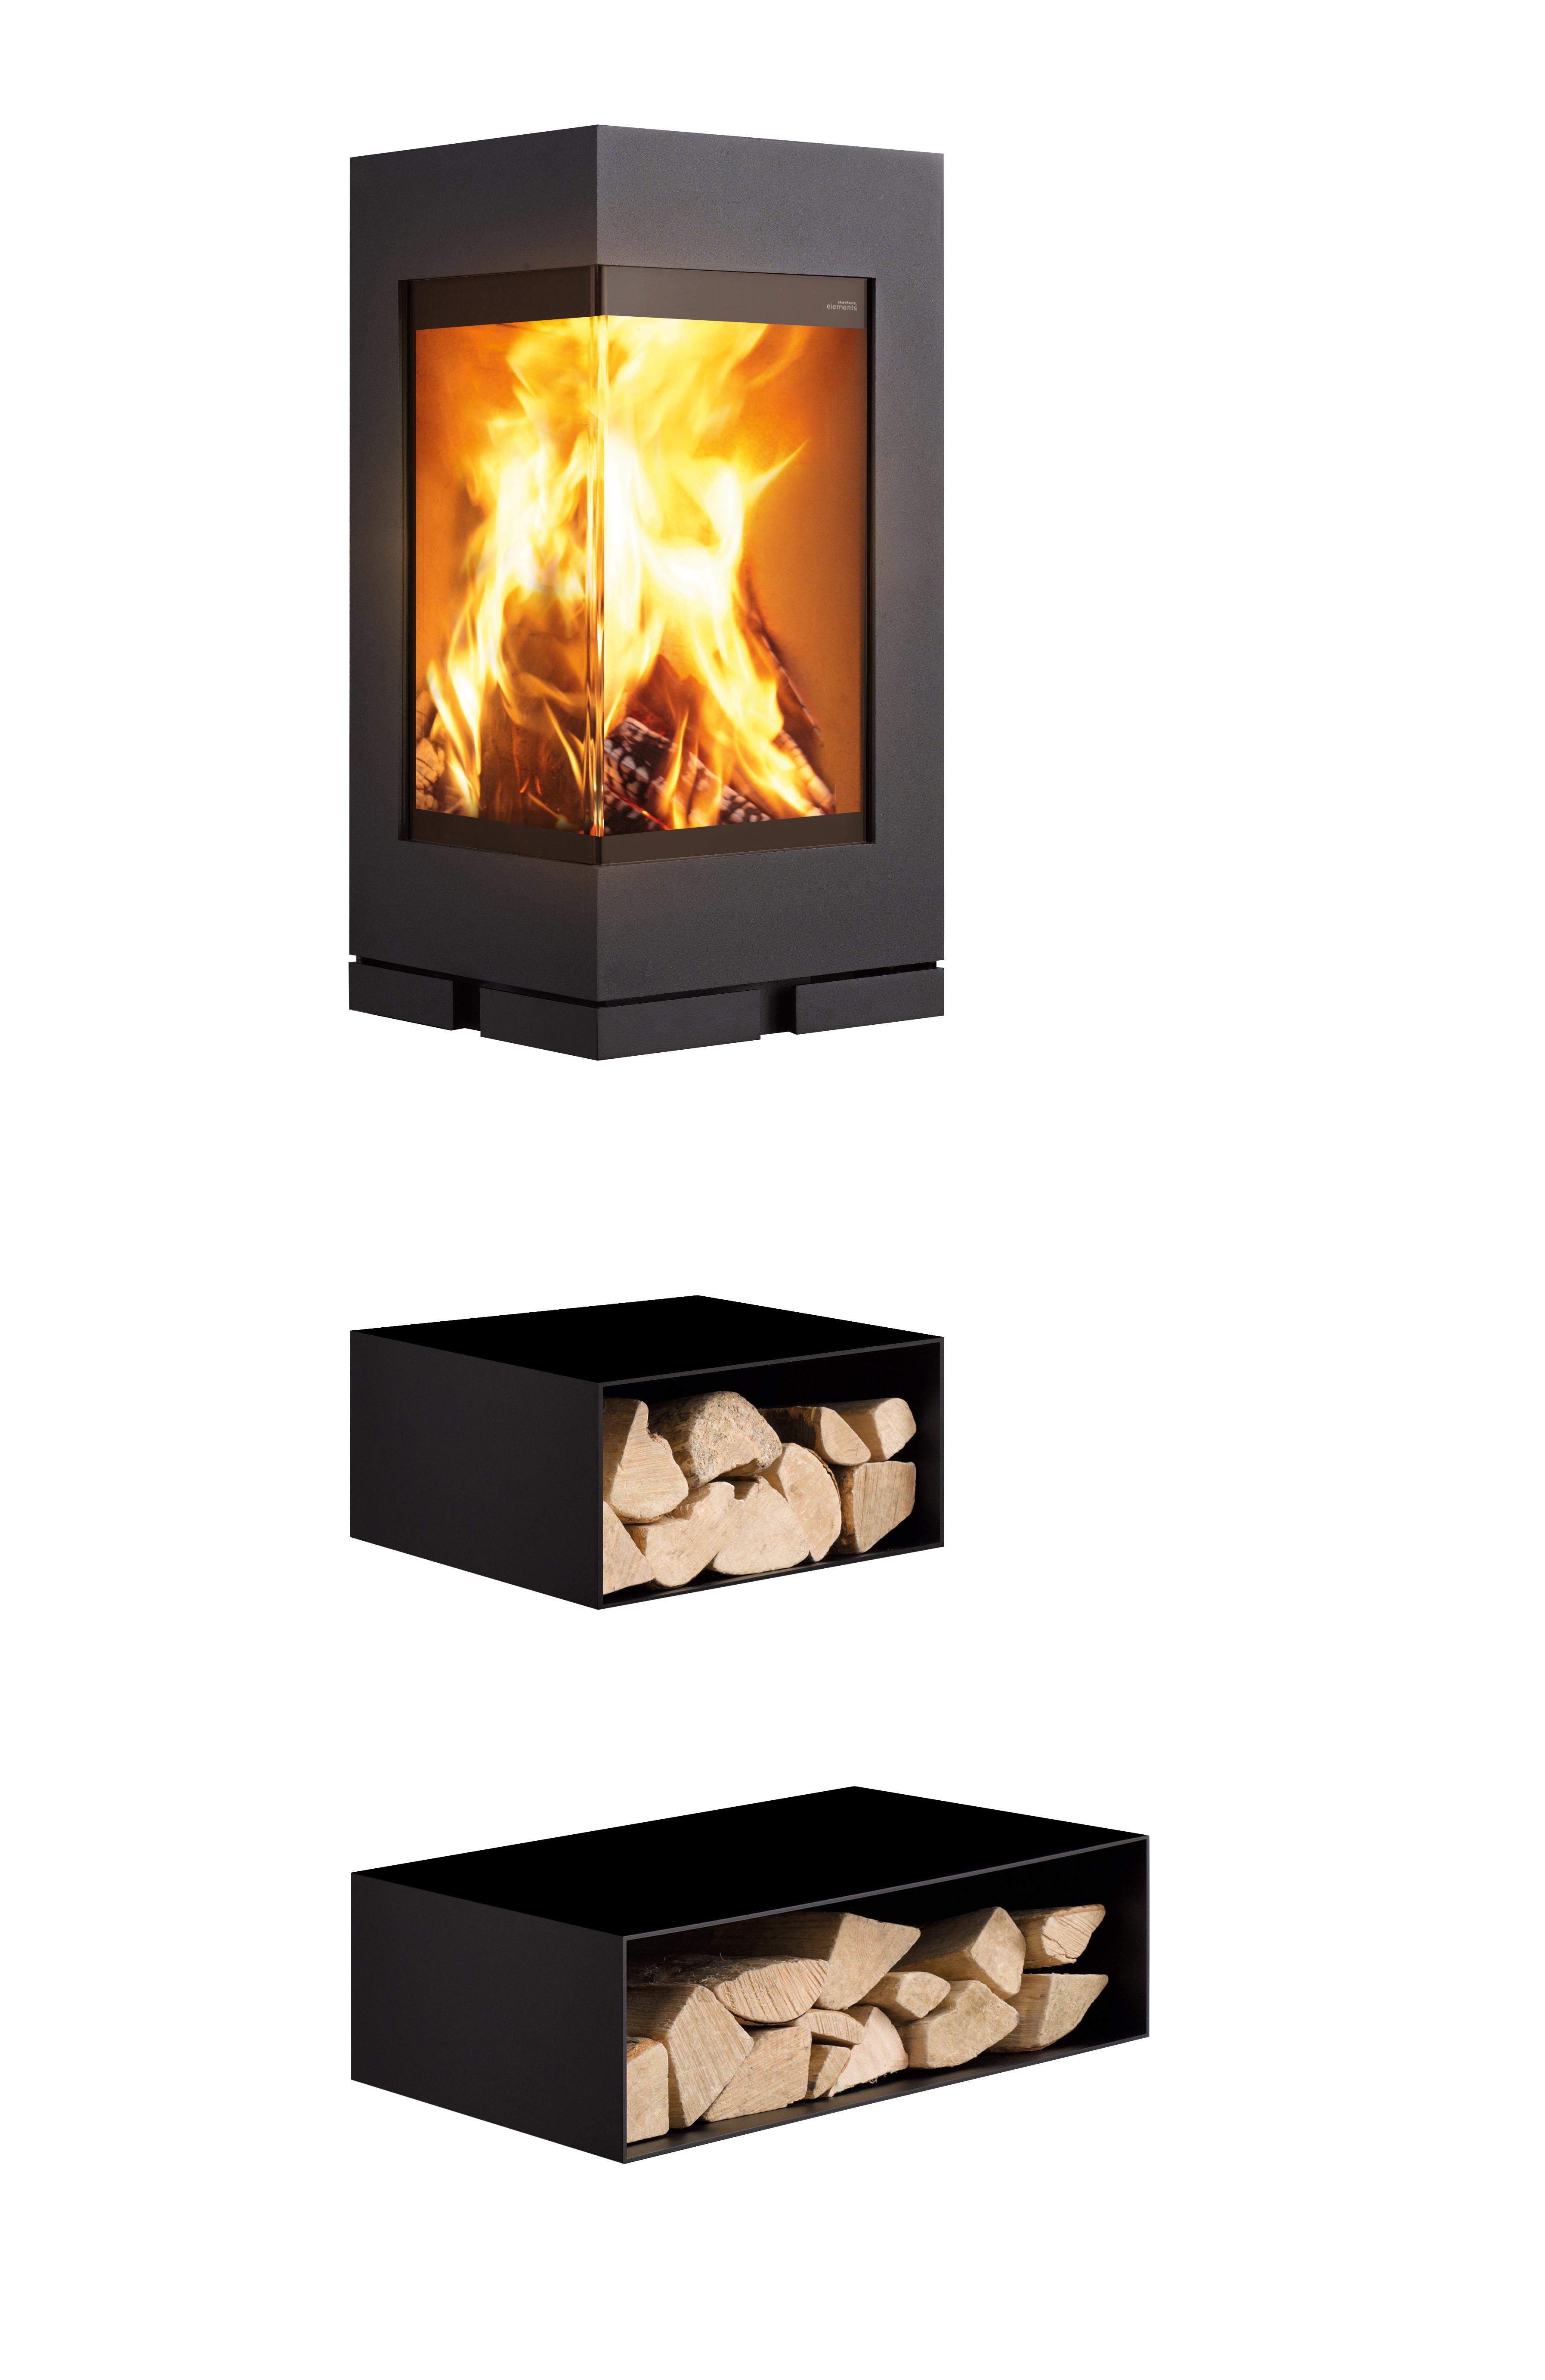 stahlinnovationspreis 2015 lvr industriemuseum. Black Bedroom Furniture Sets. Home Design Ideas